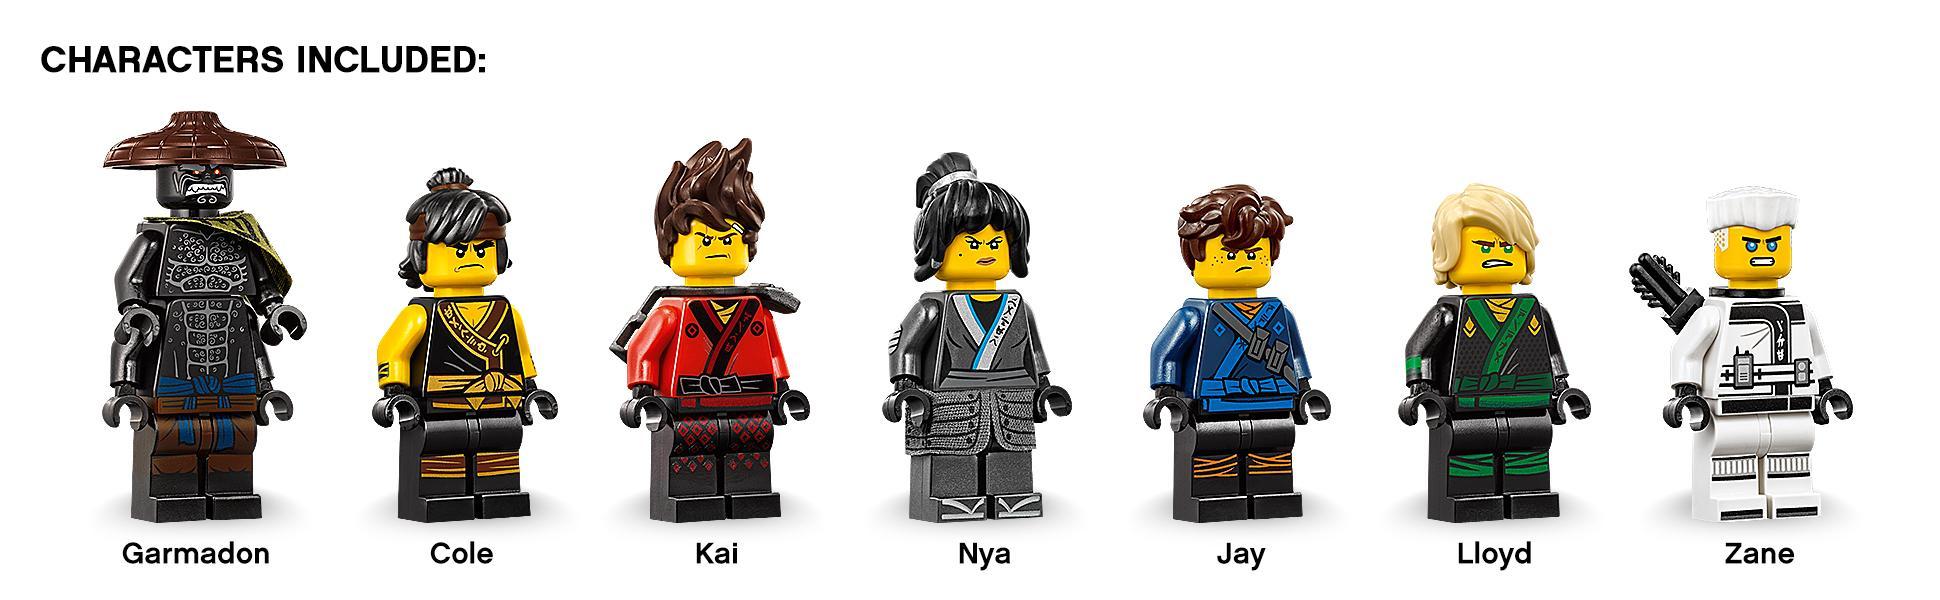 Lego Ninjago Temple Ultimate Weapon Building Kit